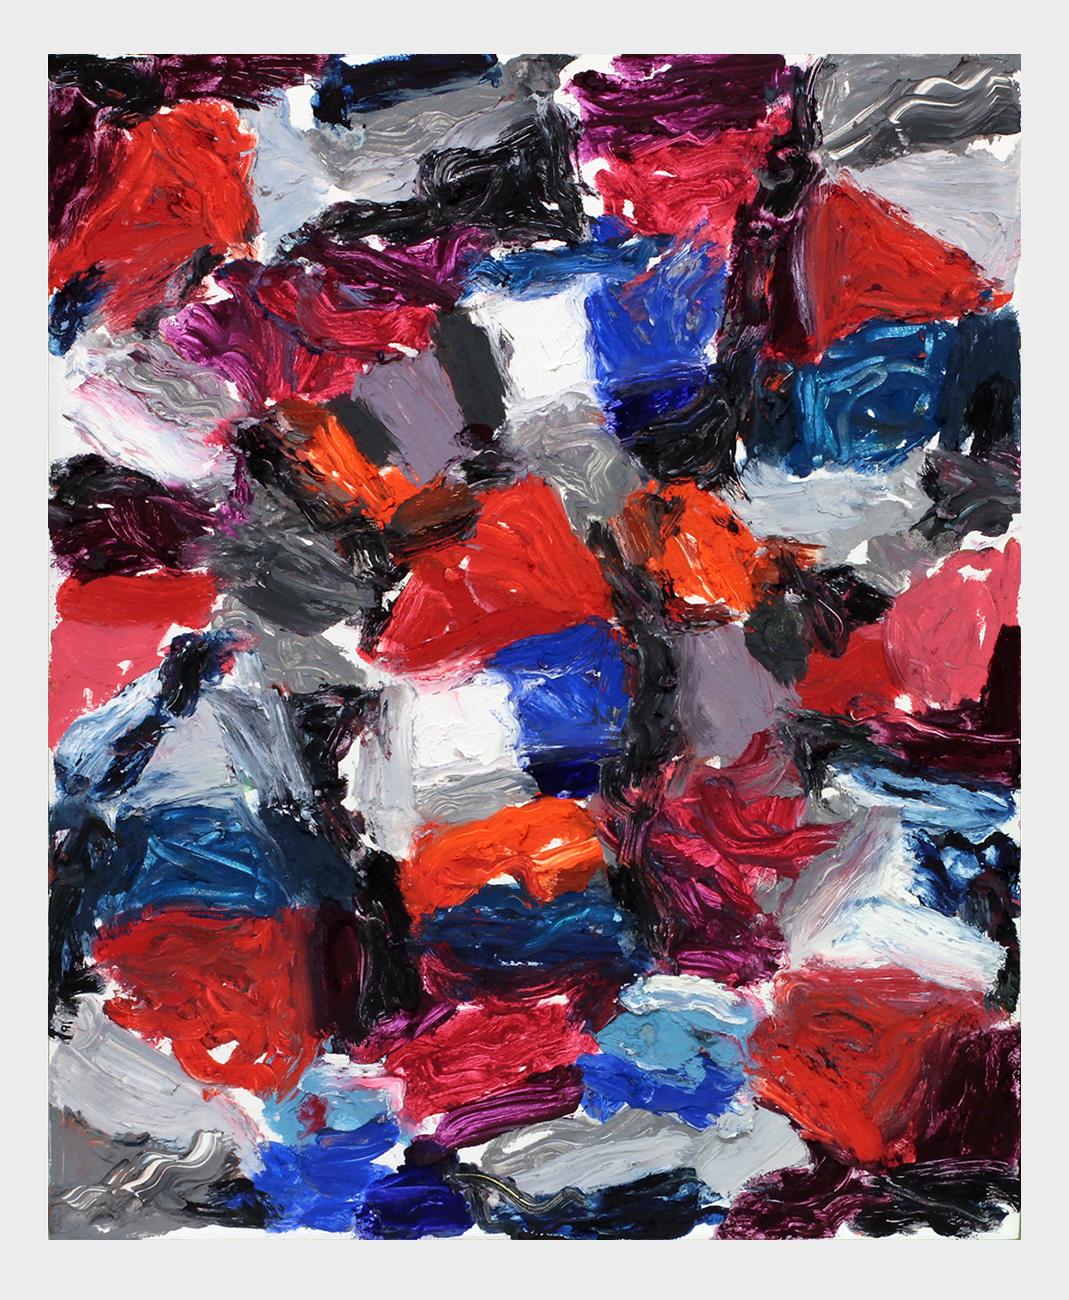 Drawing B.C. (Night Swim)   Oil pastel on board  2017  10 x 8 inches  (25.4 x 20.32 cm)